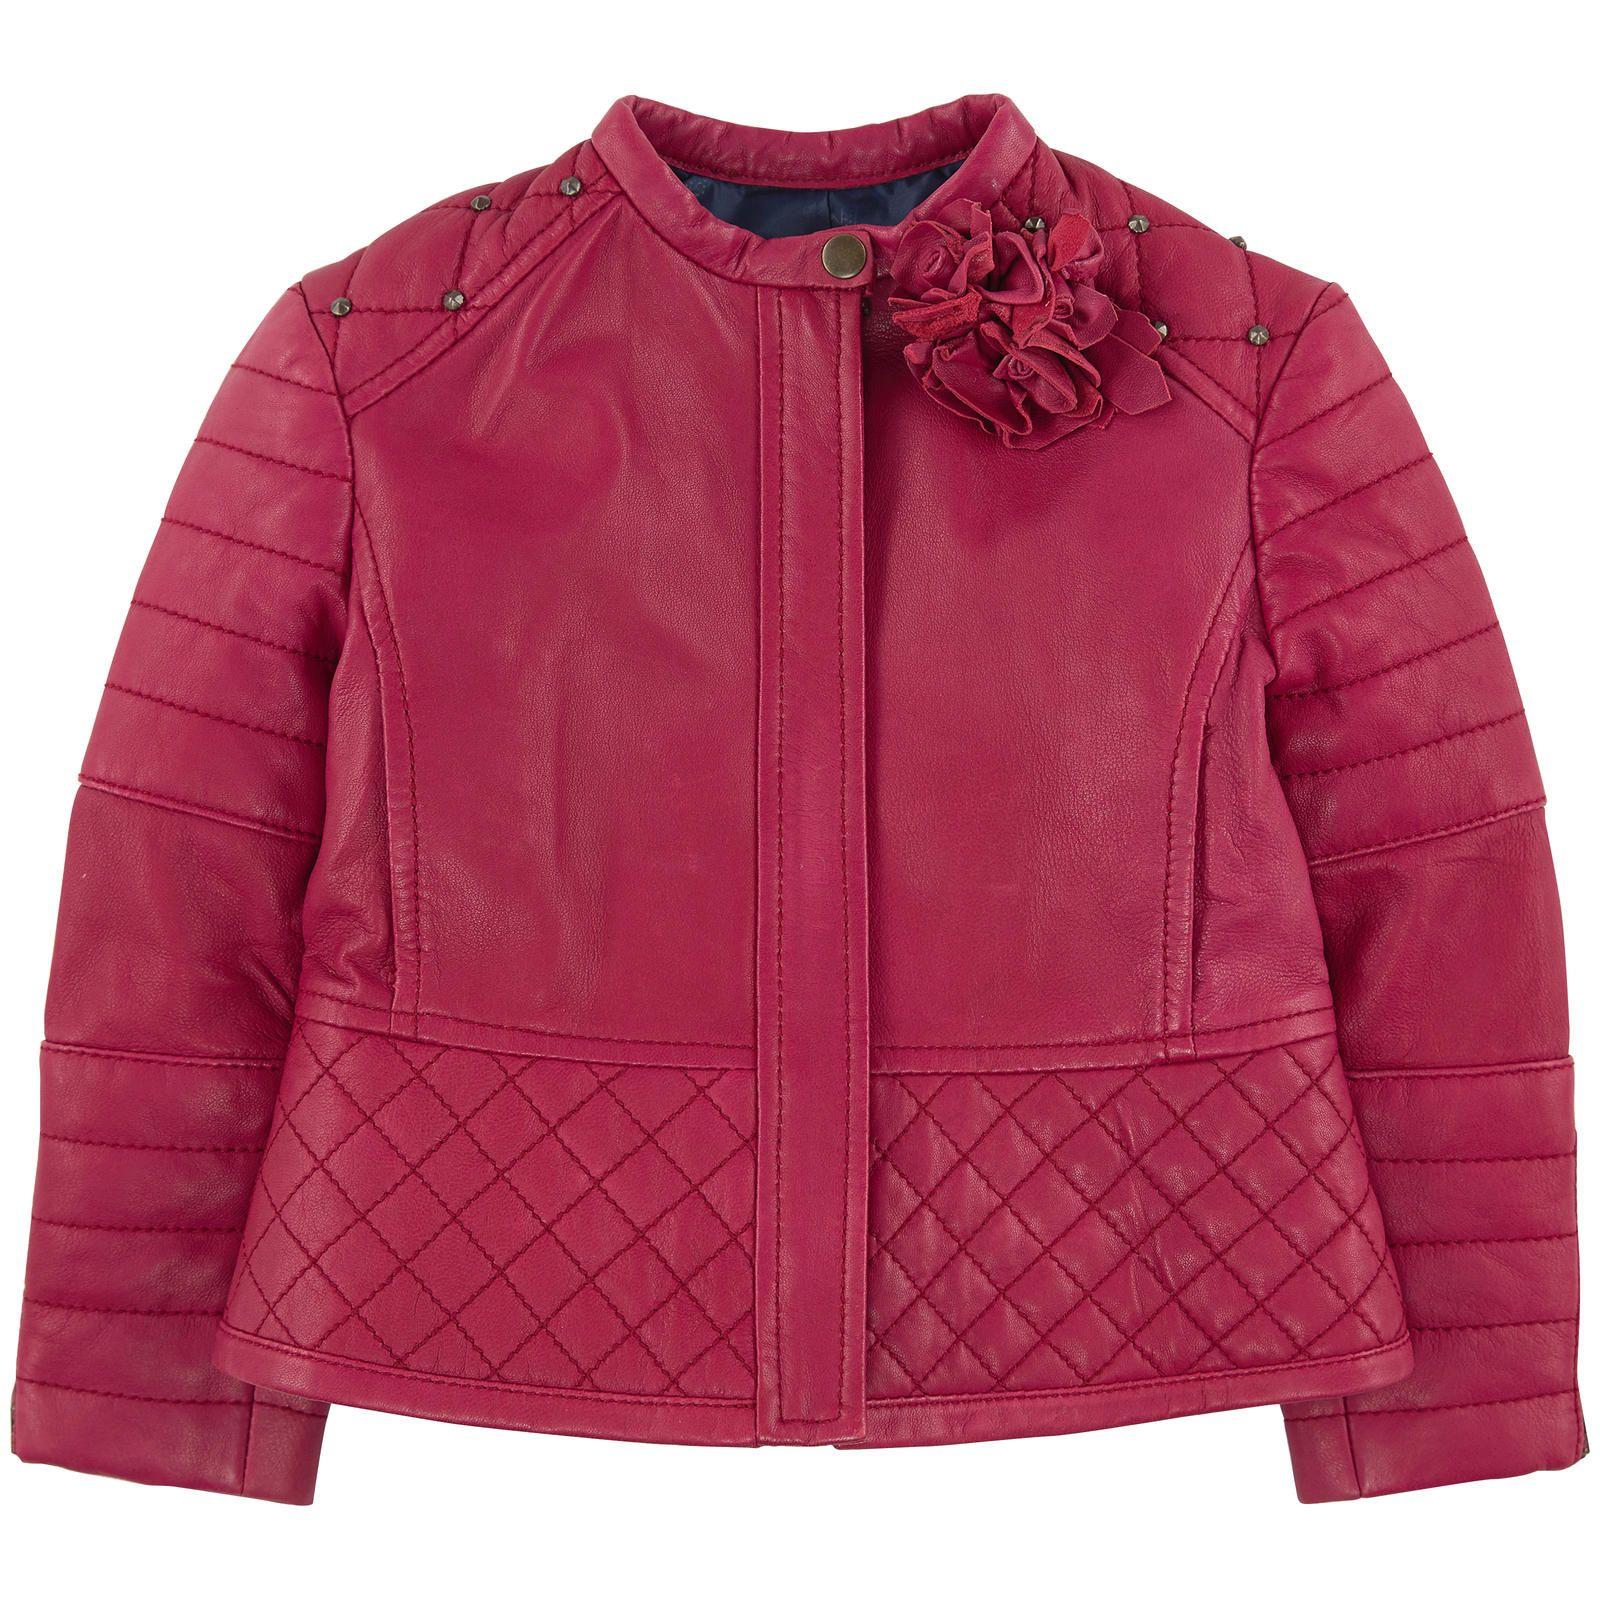 95caf9903 Leather jacket Monnalisa for girls | Melijoe.com | Girl Fall ...